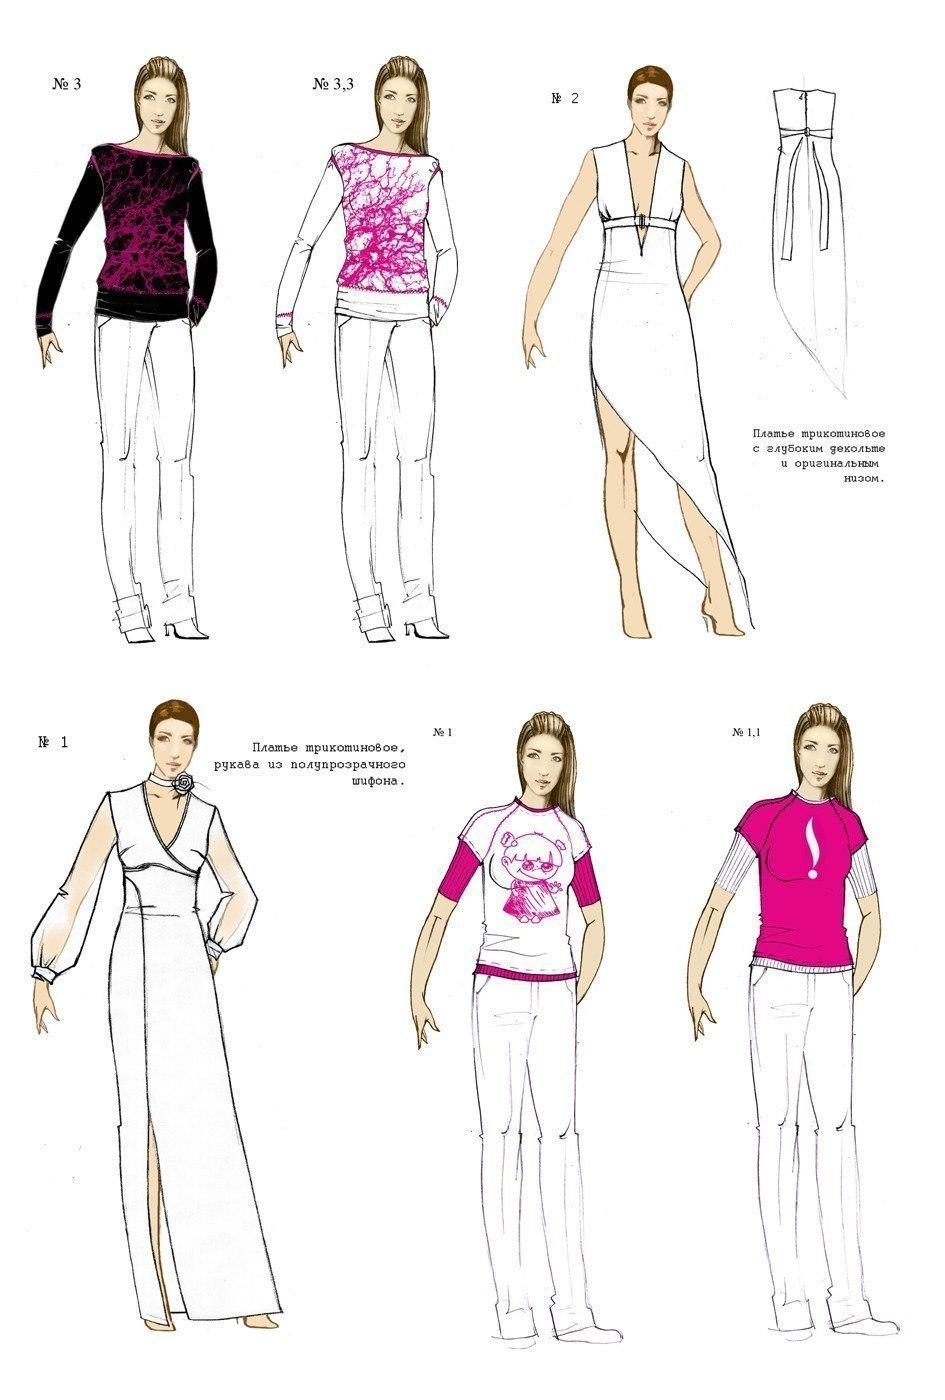 эскизы одежды -> Freelance Job -> фриланс и ...: www.freelancejob.ru/users/Toropovich/portfolio/53837